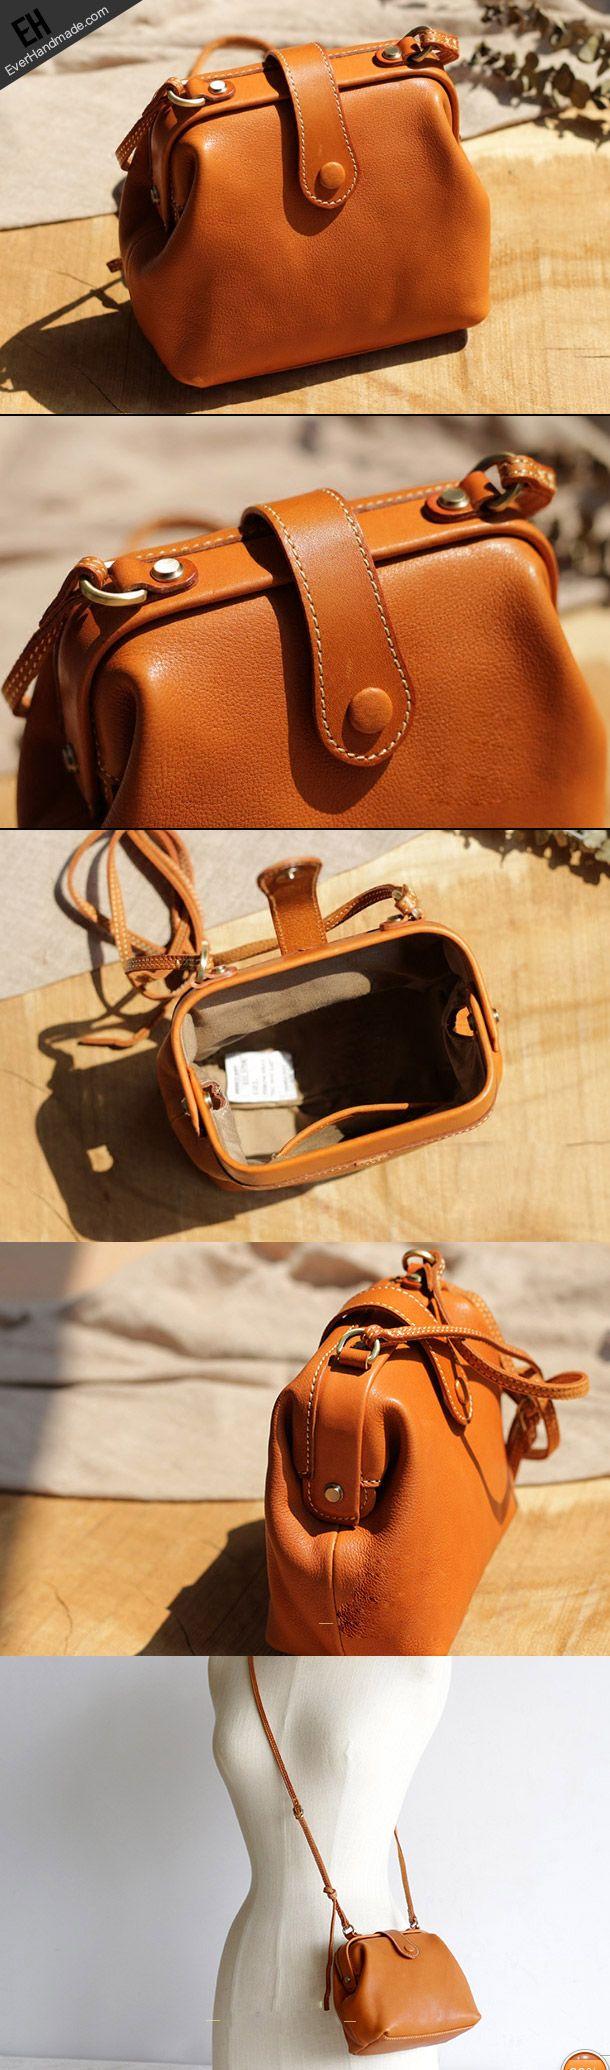 Handmade Leather phone bag for women leather shoulder bag